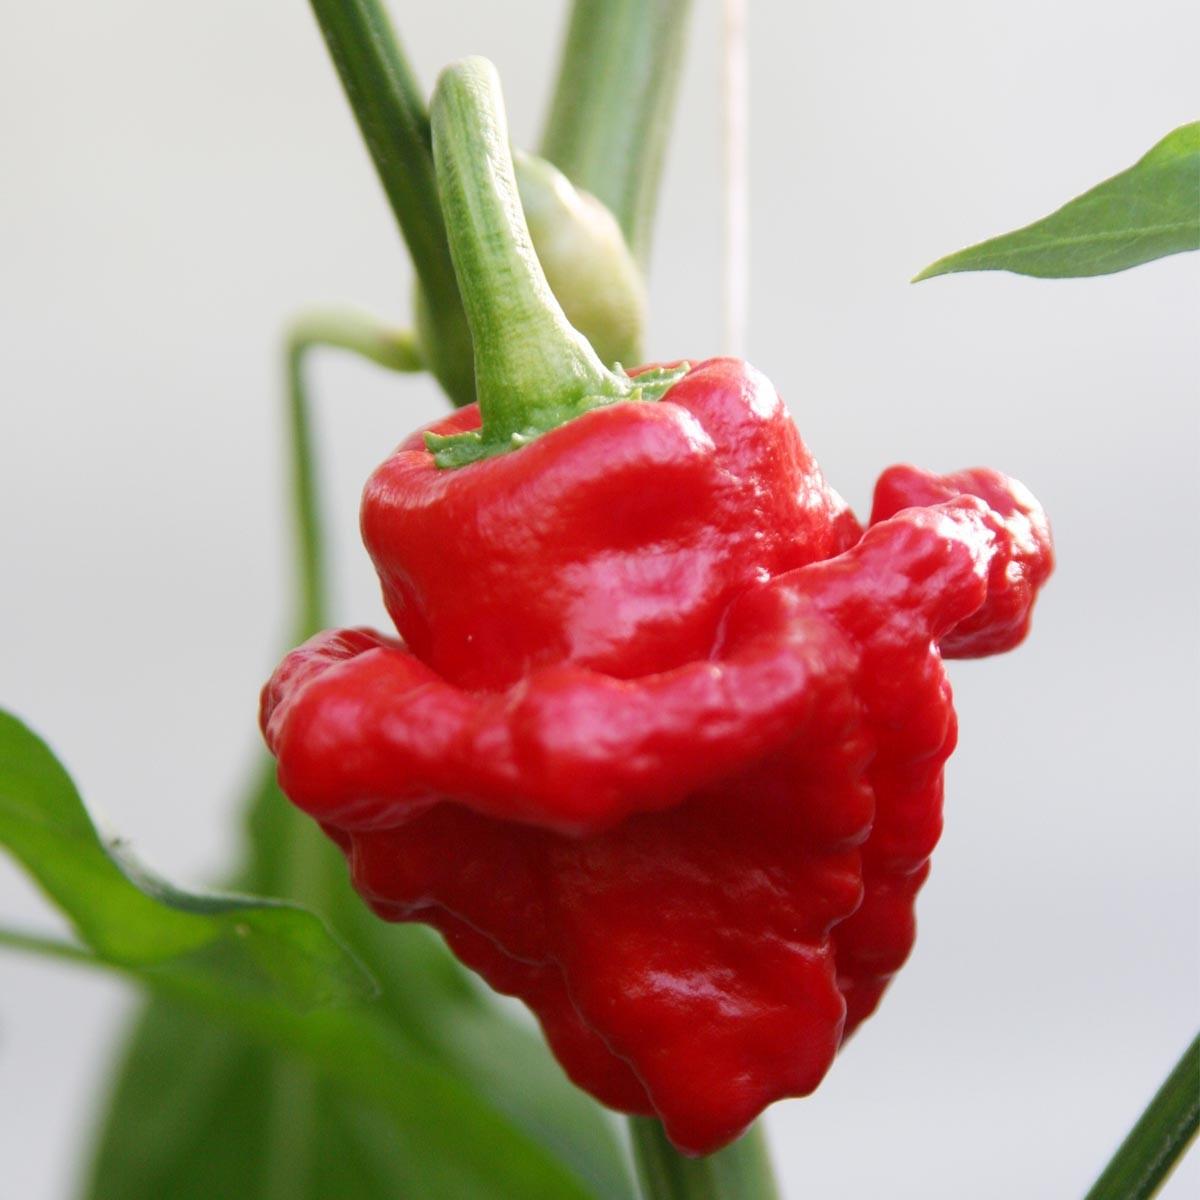 Scotch Bonnet Chili 'Animo® Red' extrem scharf